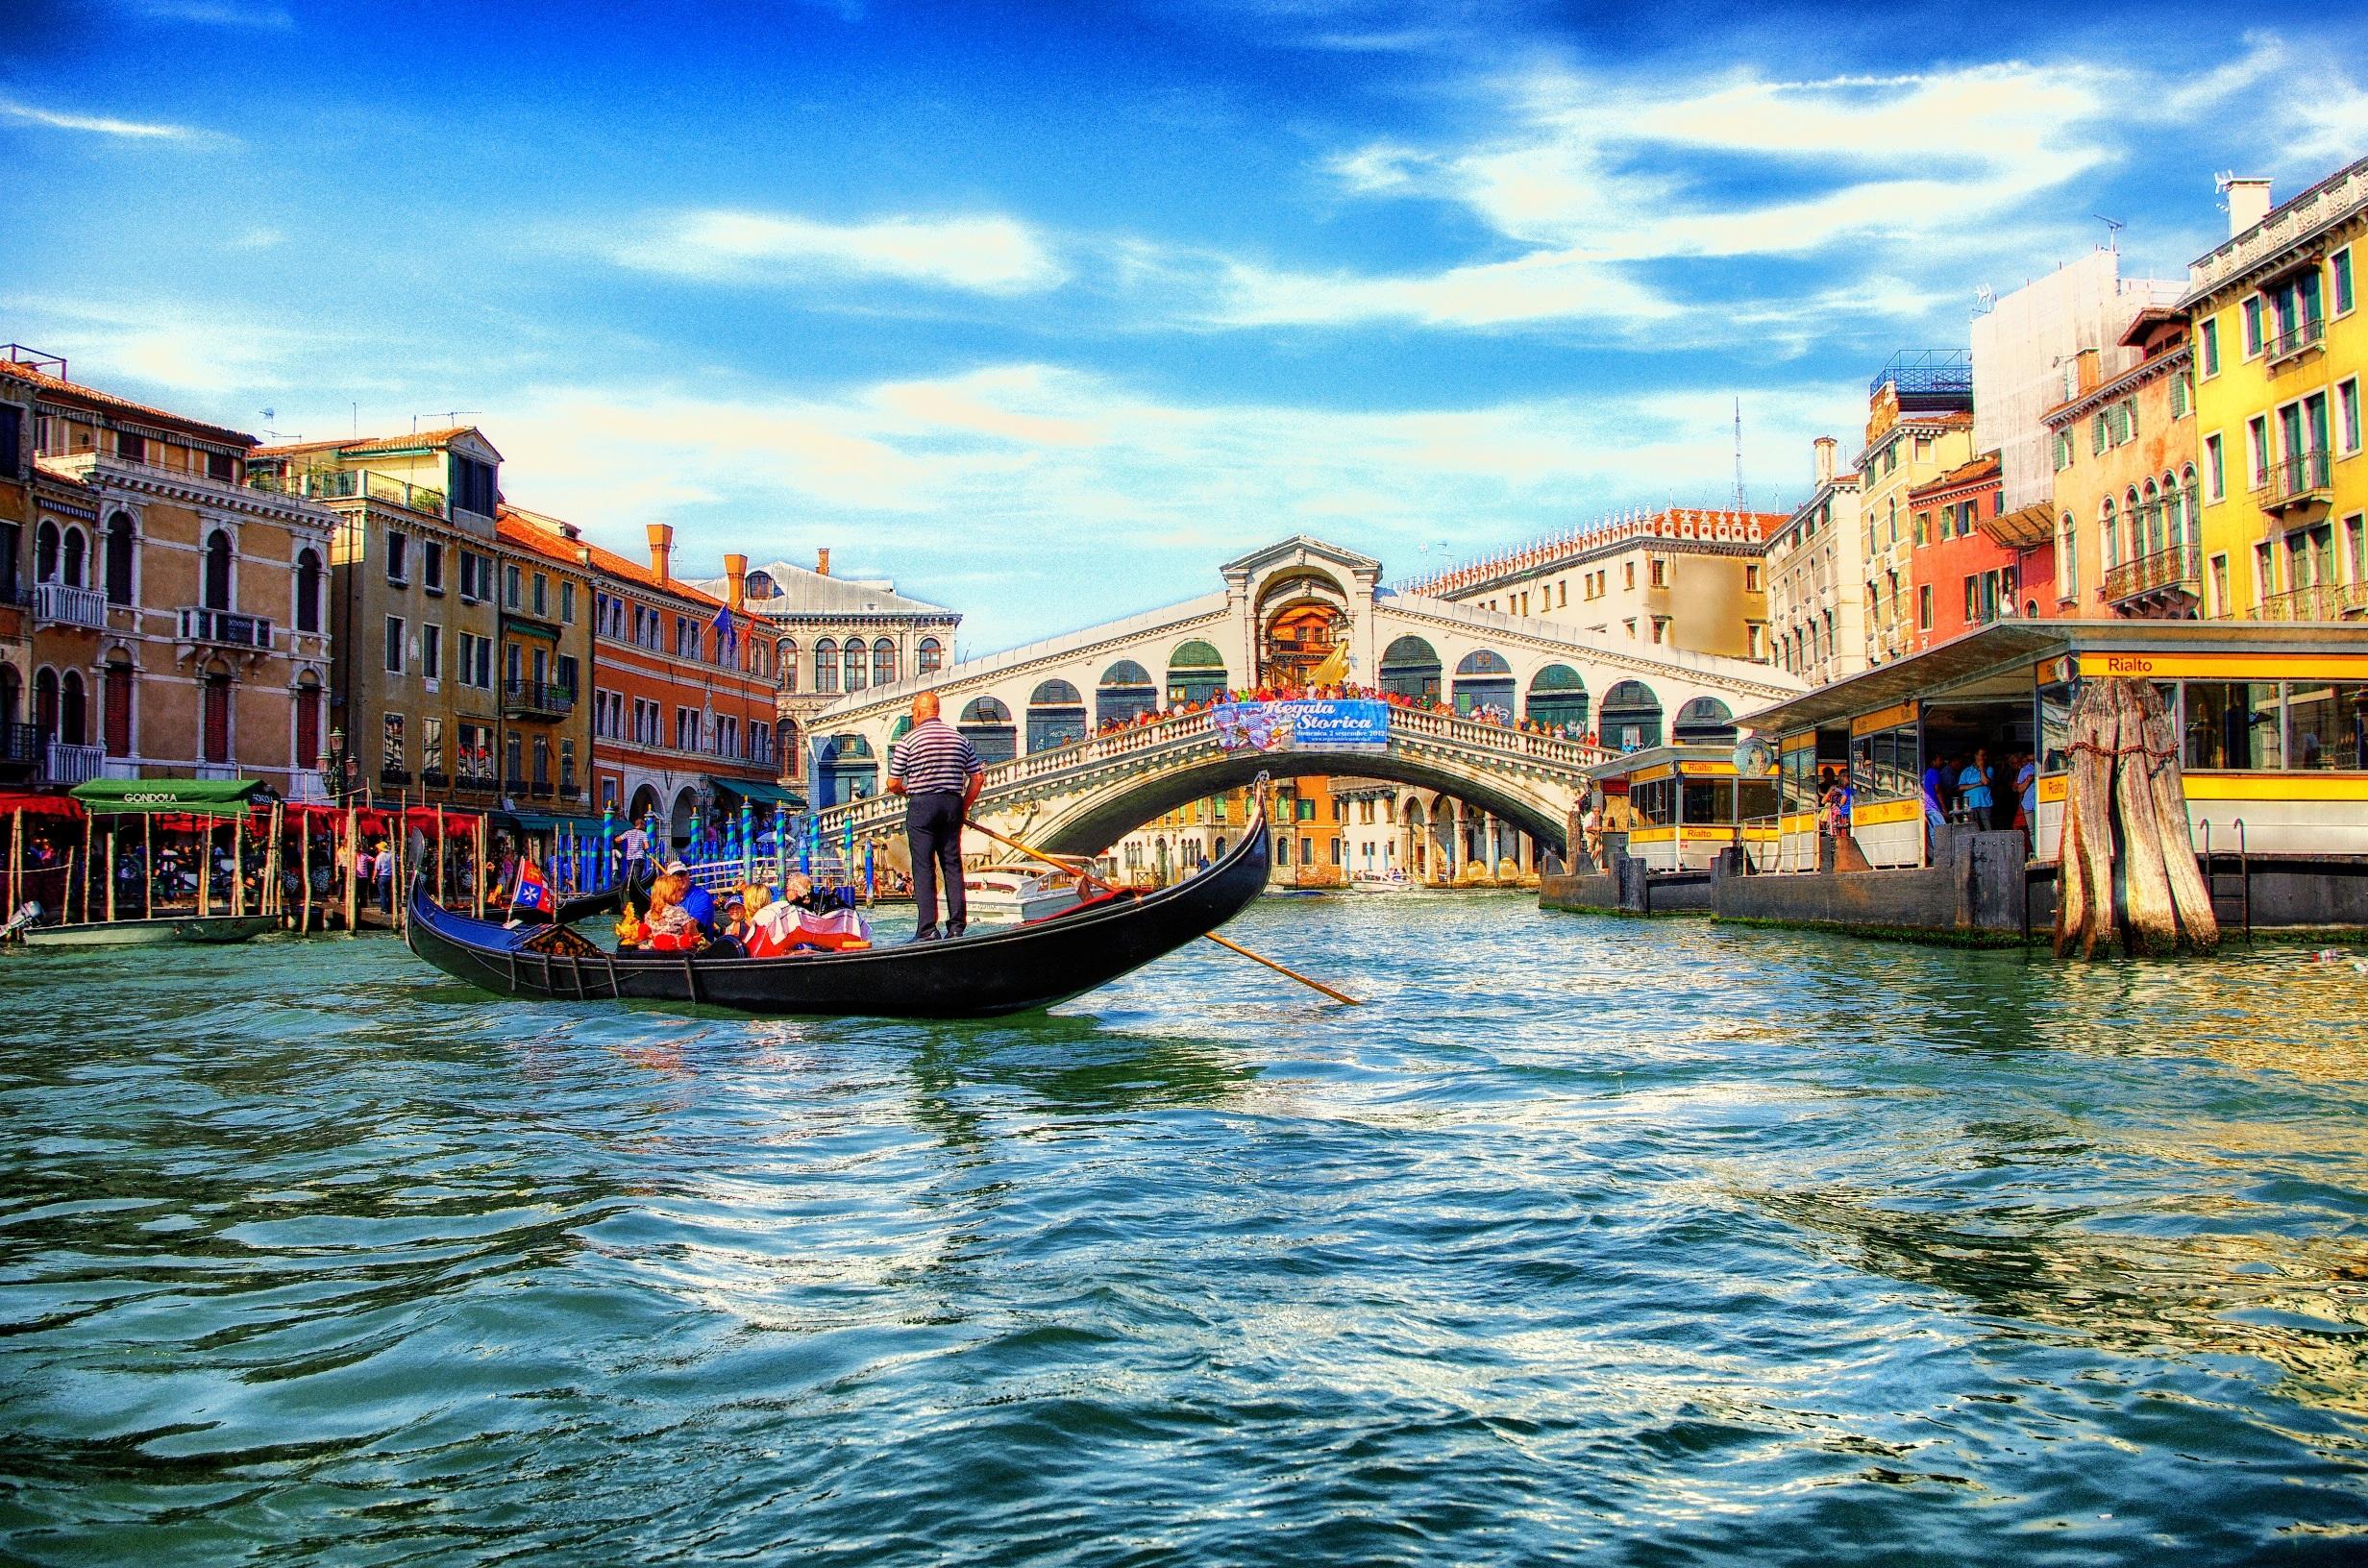 Rialto Bridge, The Old Bridge with Romantic Impression - Traveldigg.com